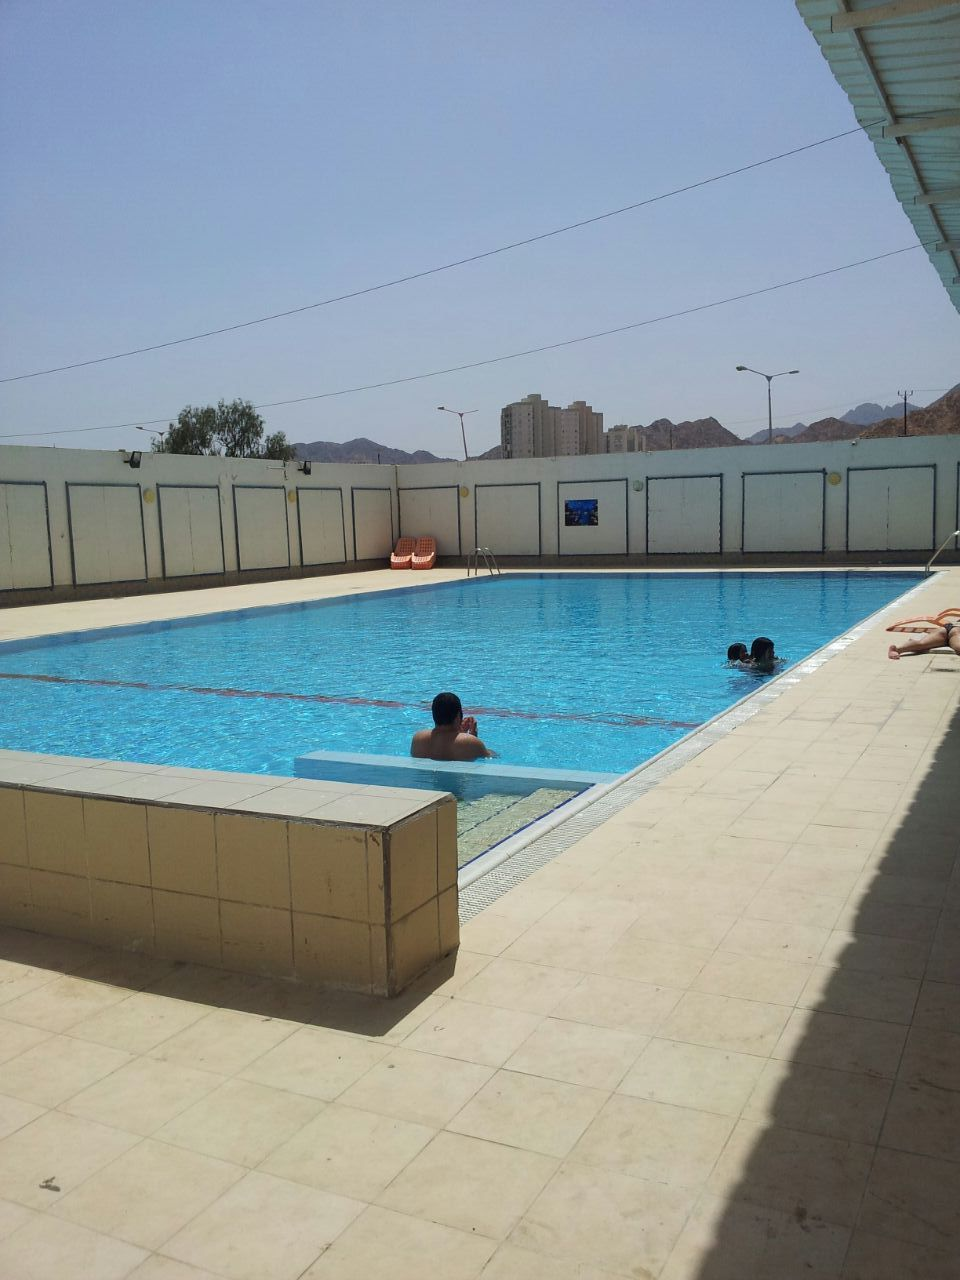 Penthouse Eilat - 2 rooms apartment